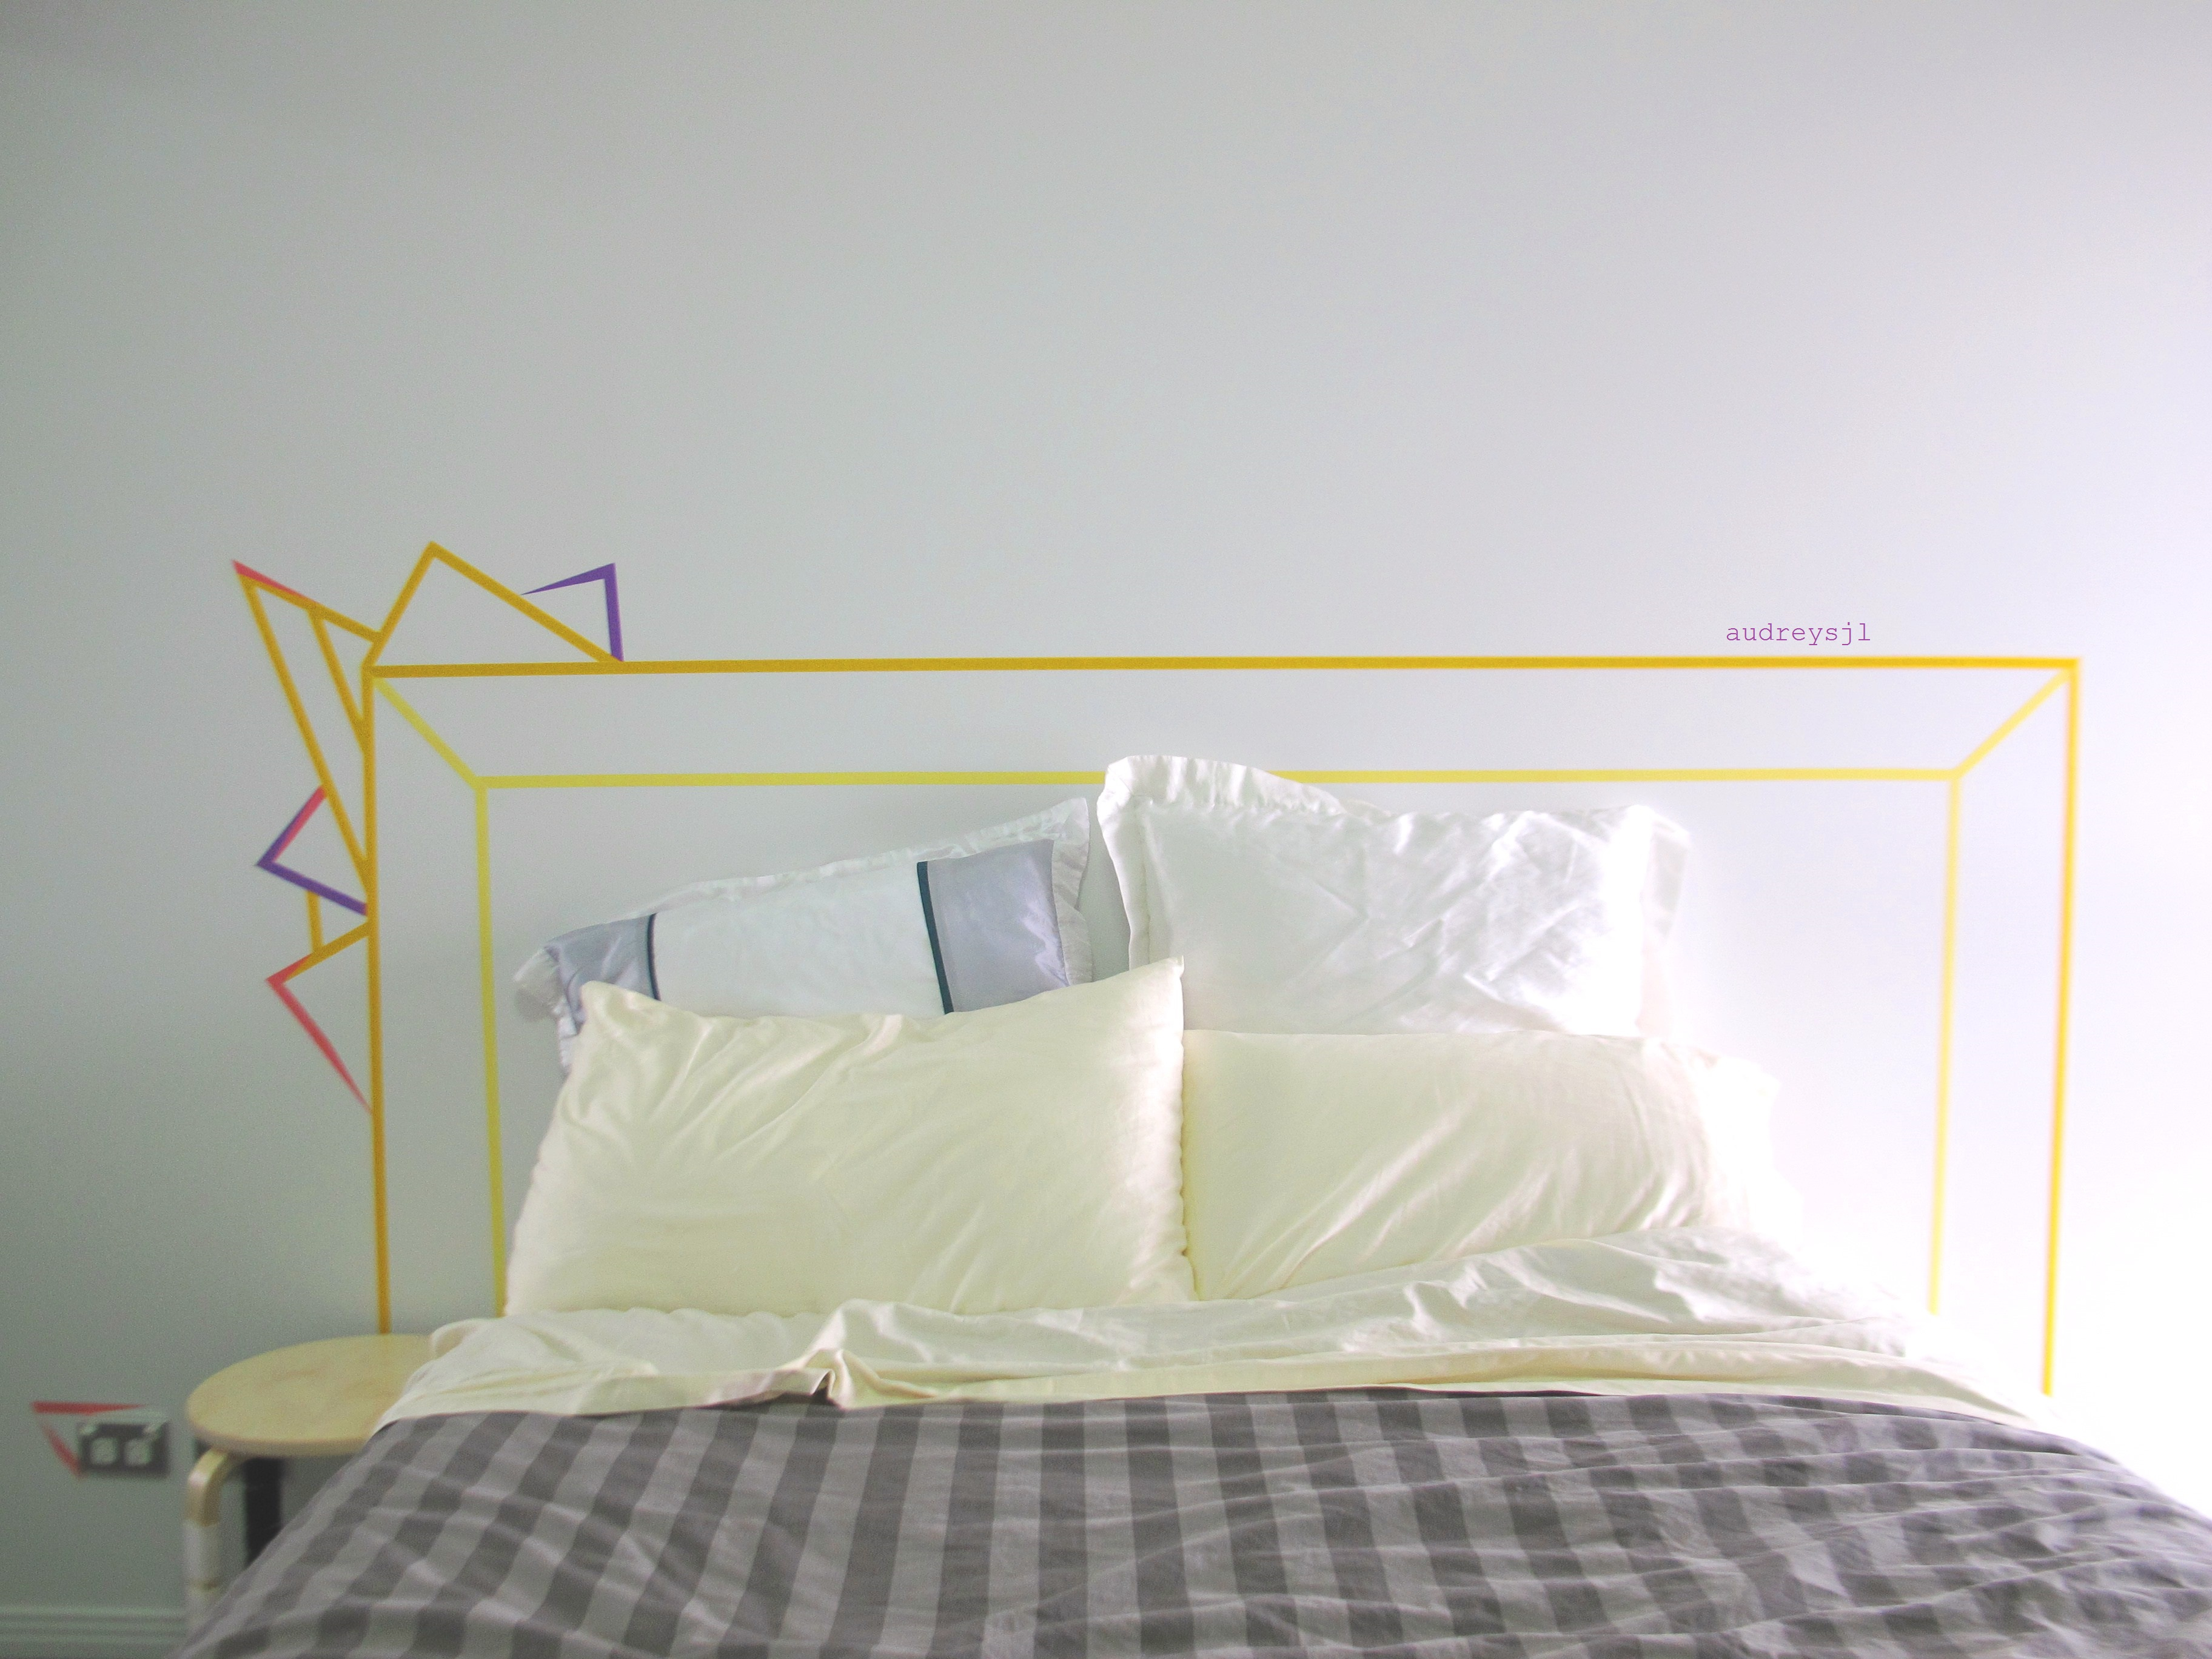 Washi tape headboard diy audreysjl - Tete de lit masking tape ...